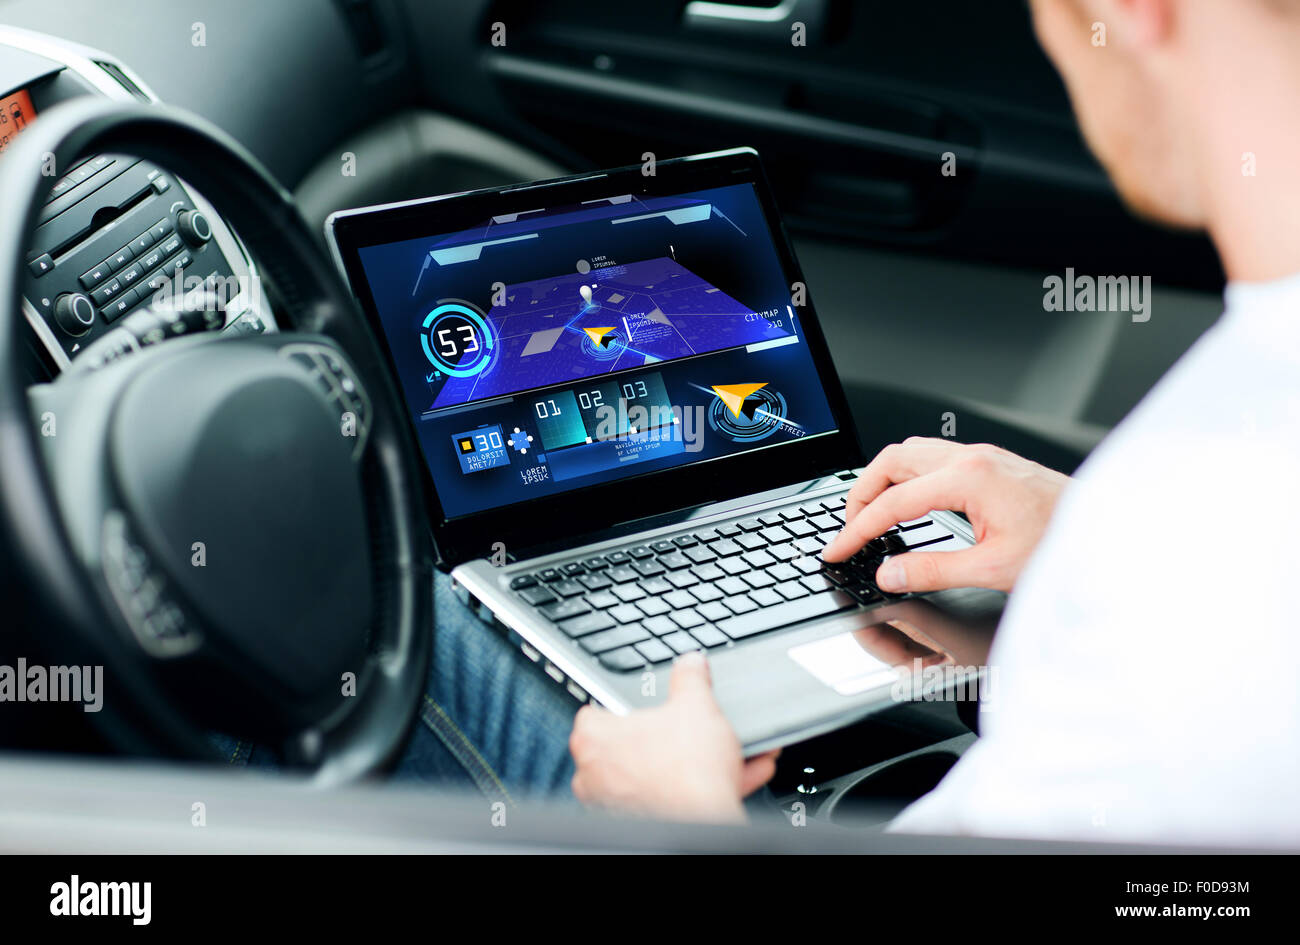 man using navigation on laptop computer in car - Stock Image